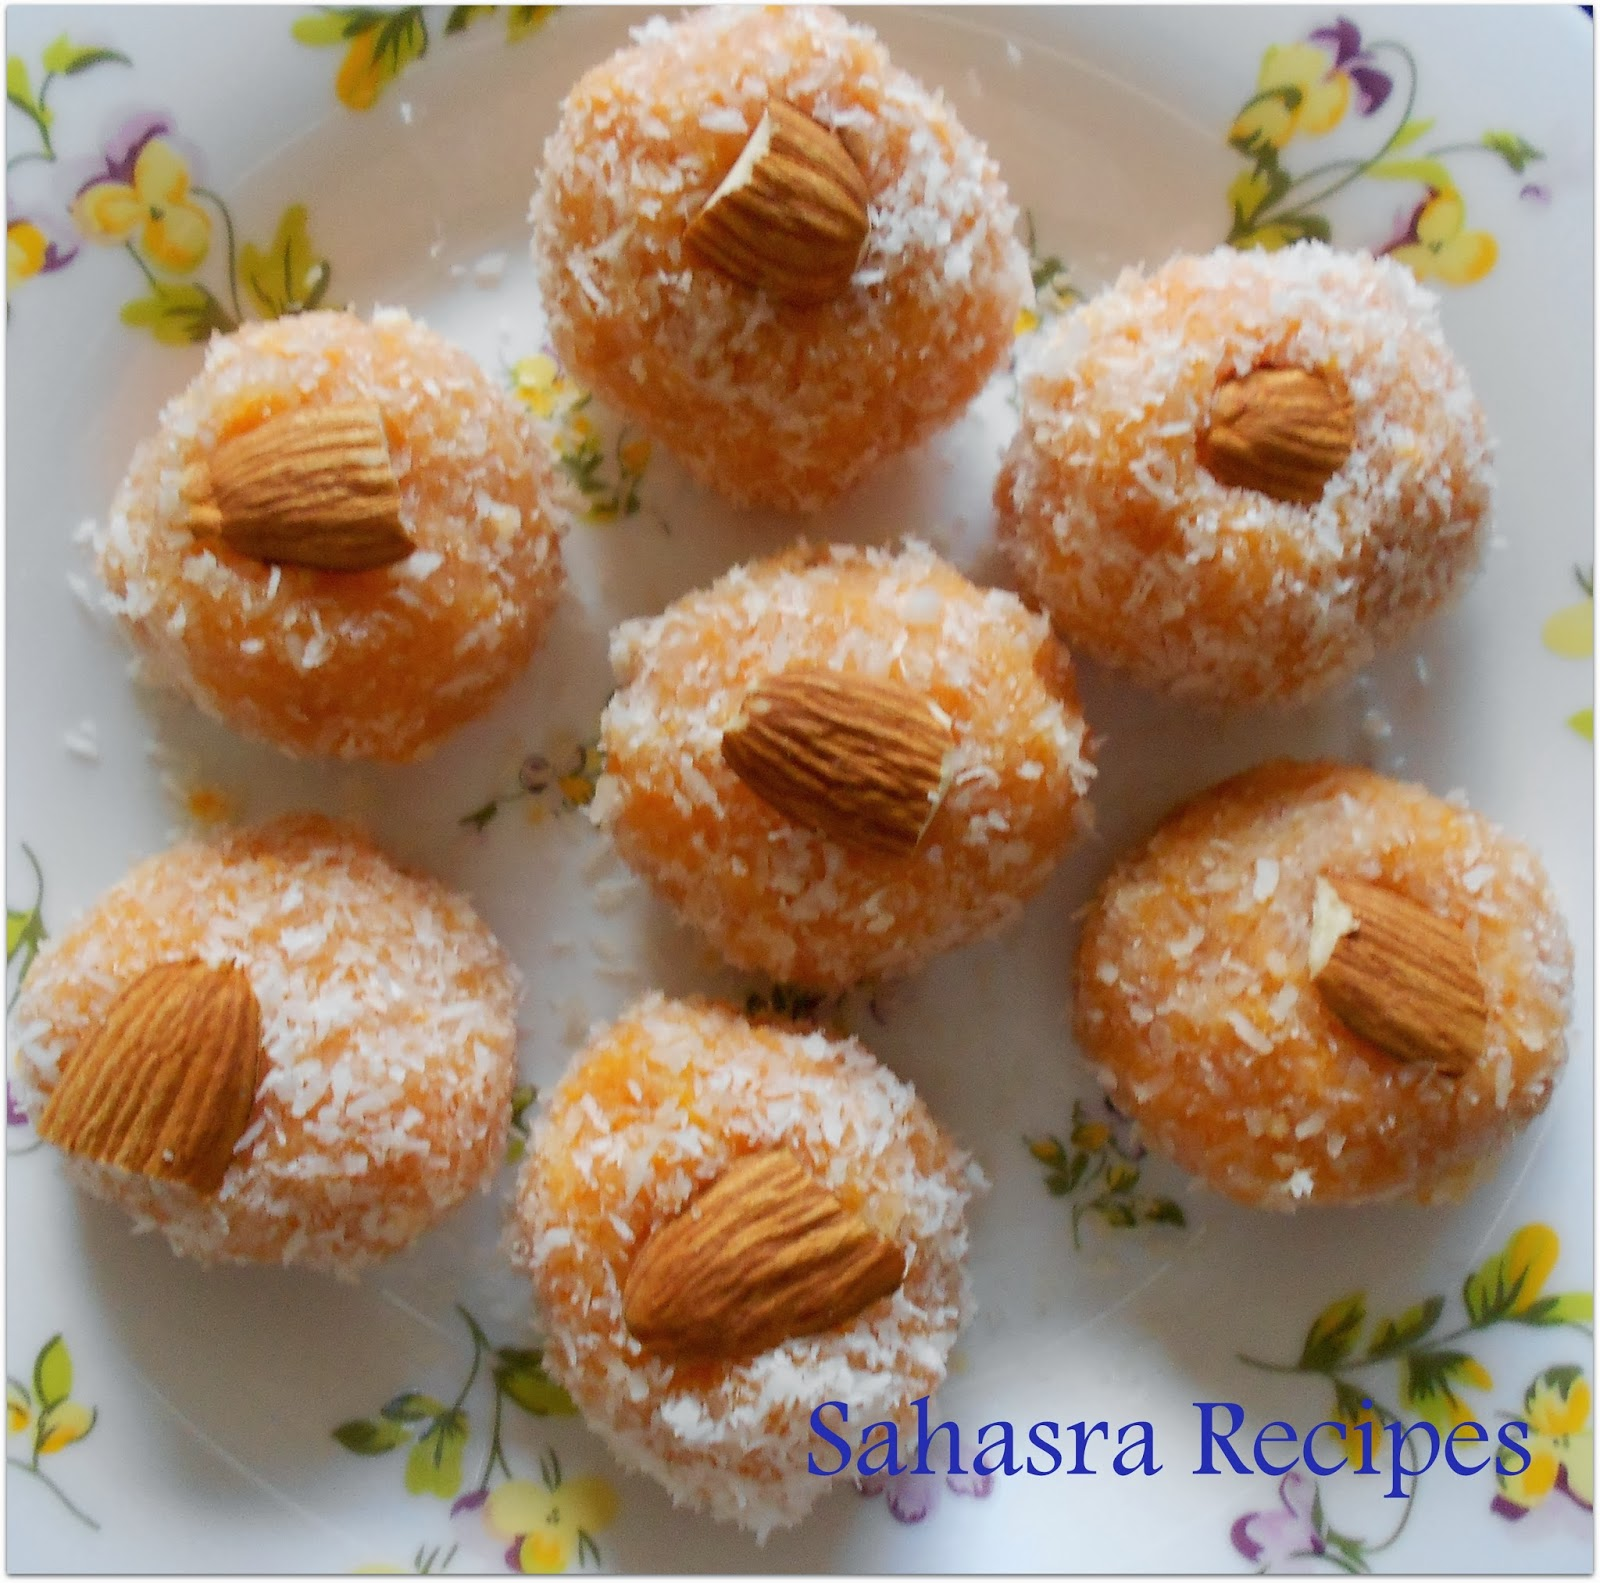 Sahasra Recipes: Sankranthi Shubhakanshalu / Happy Pongal